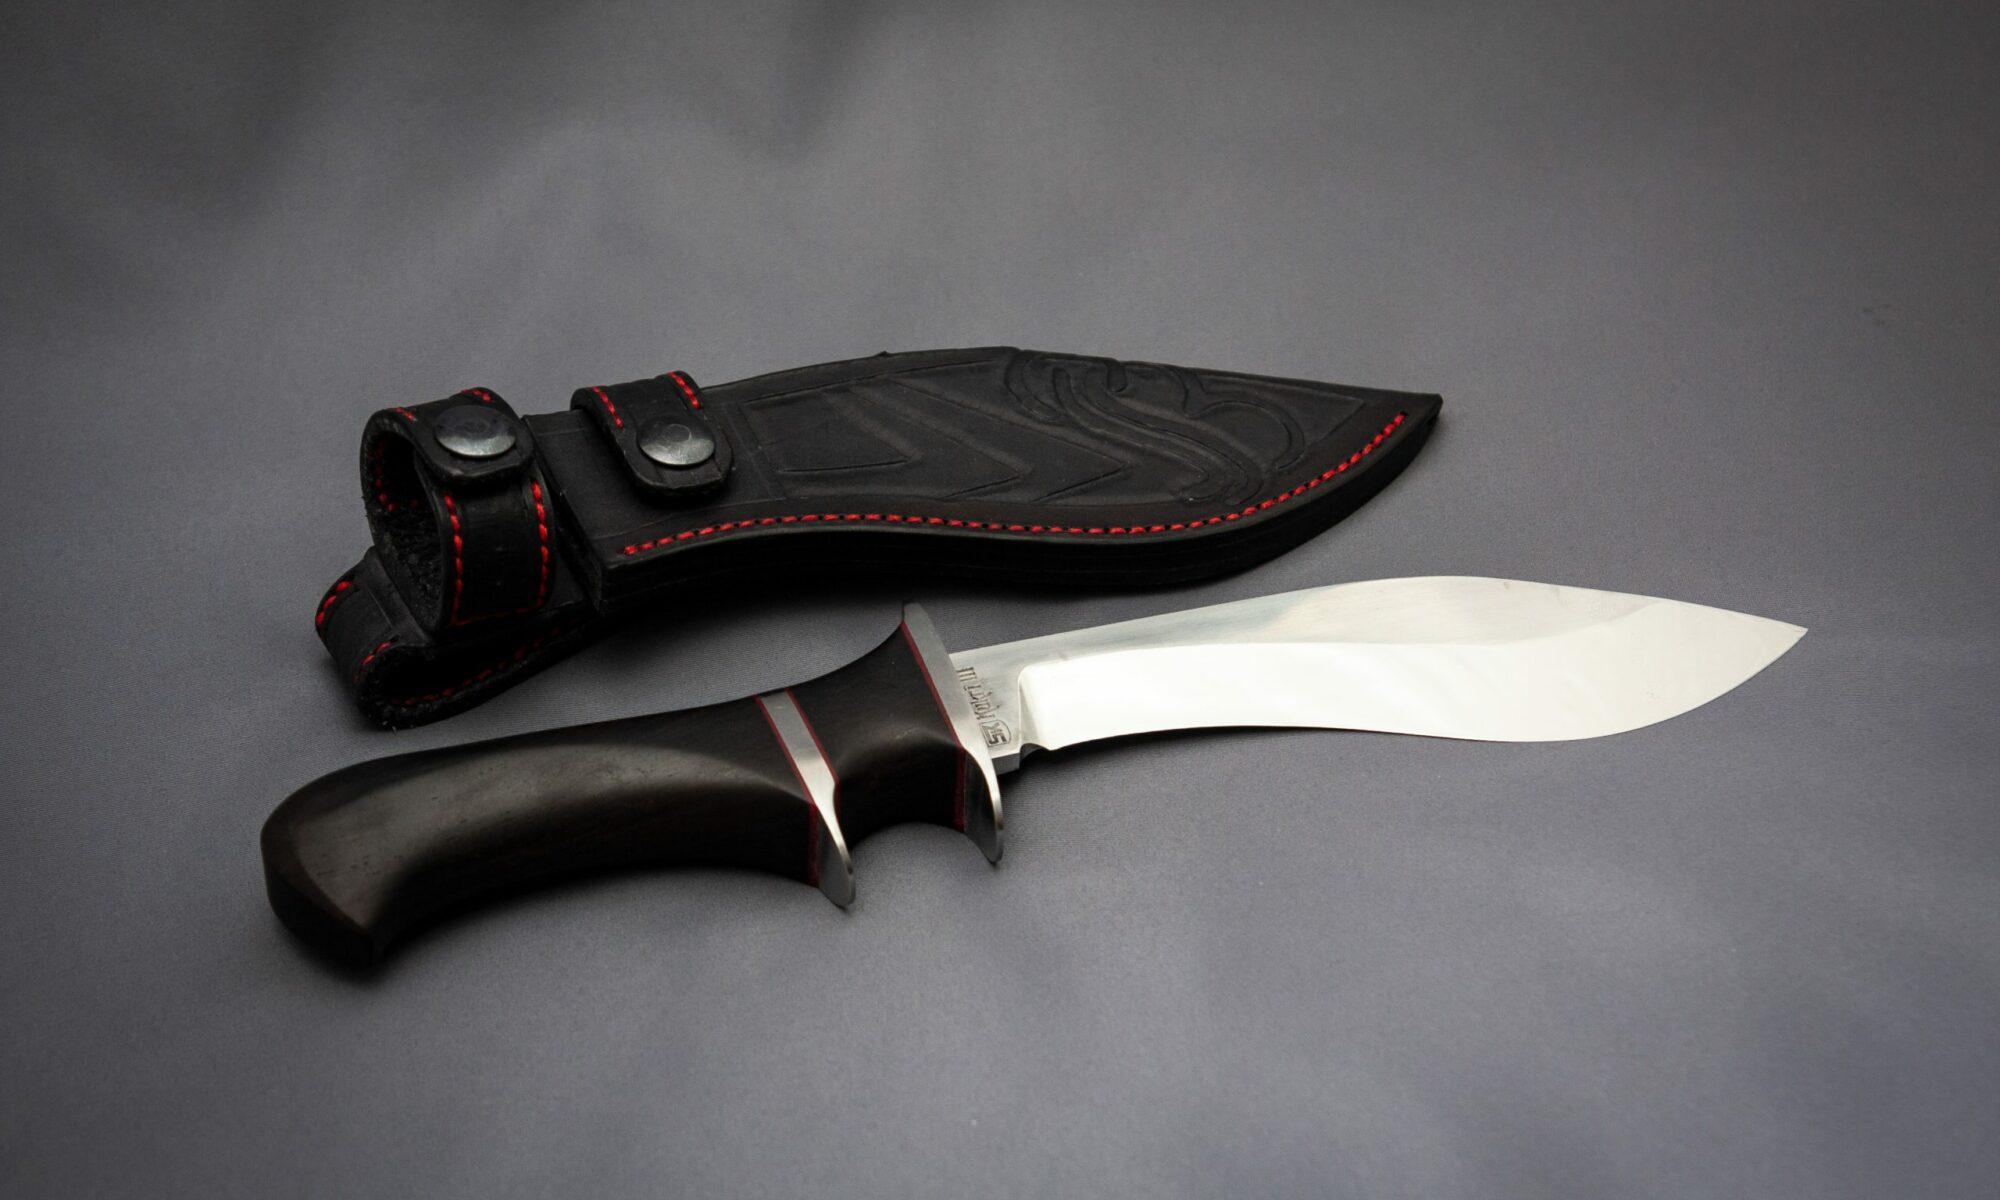 Custom made Kukri III knife with leather sheath